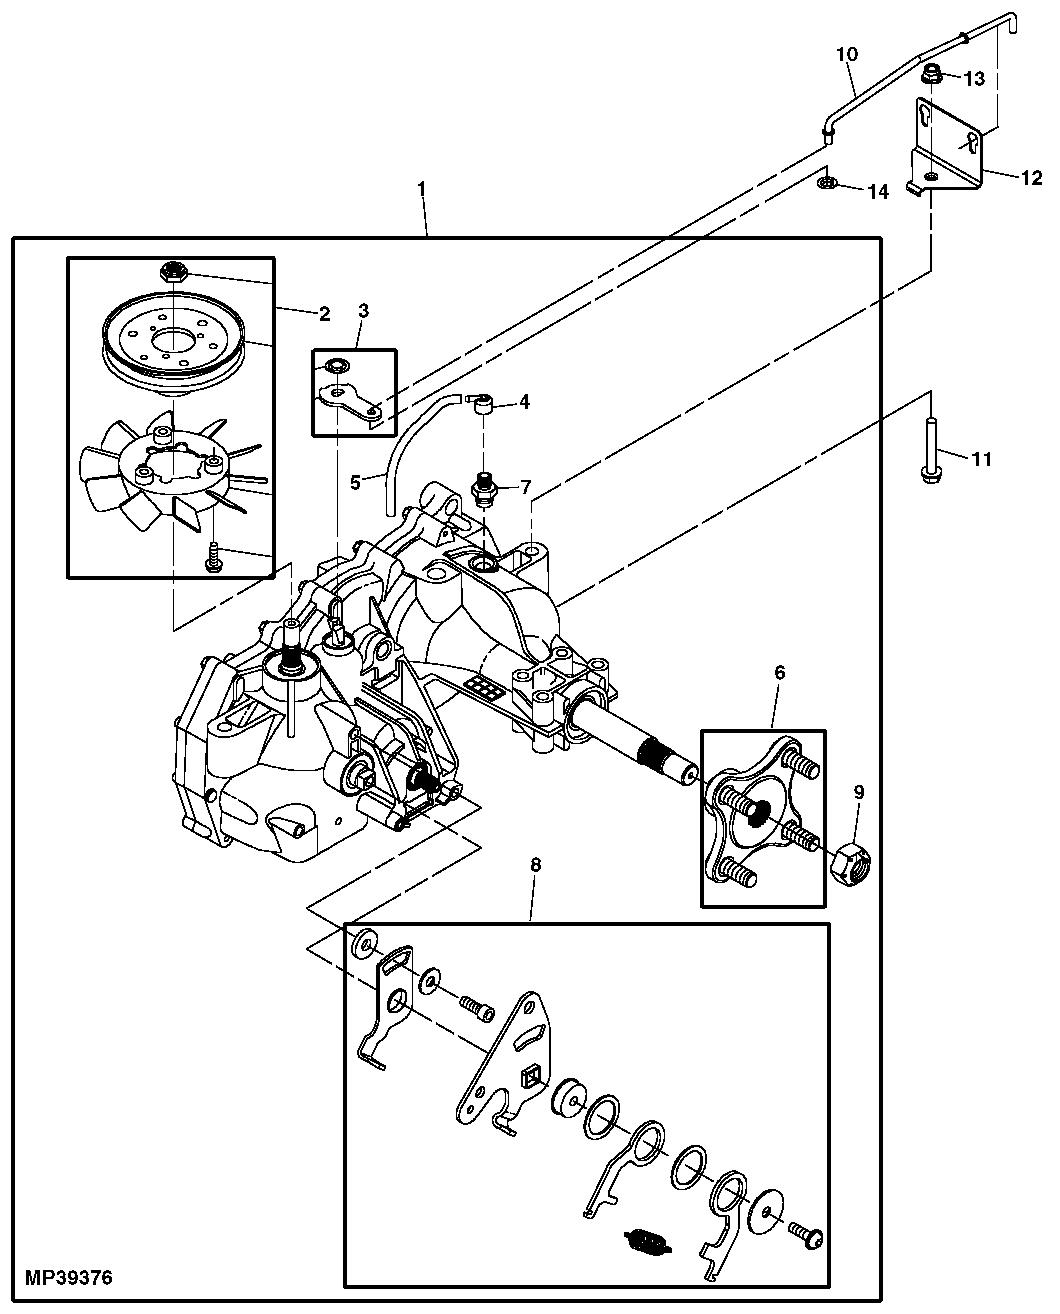 john deere 4040 hvac wiring diagram